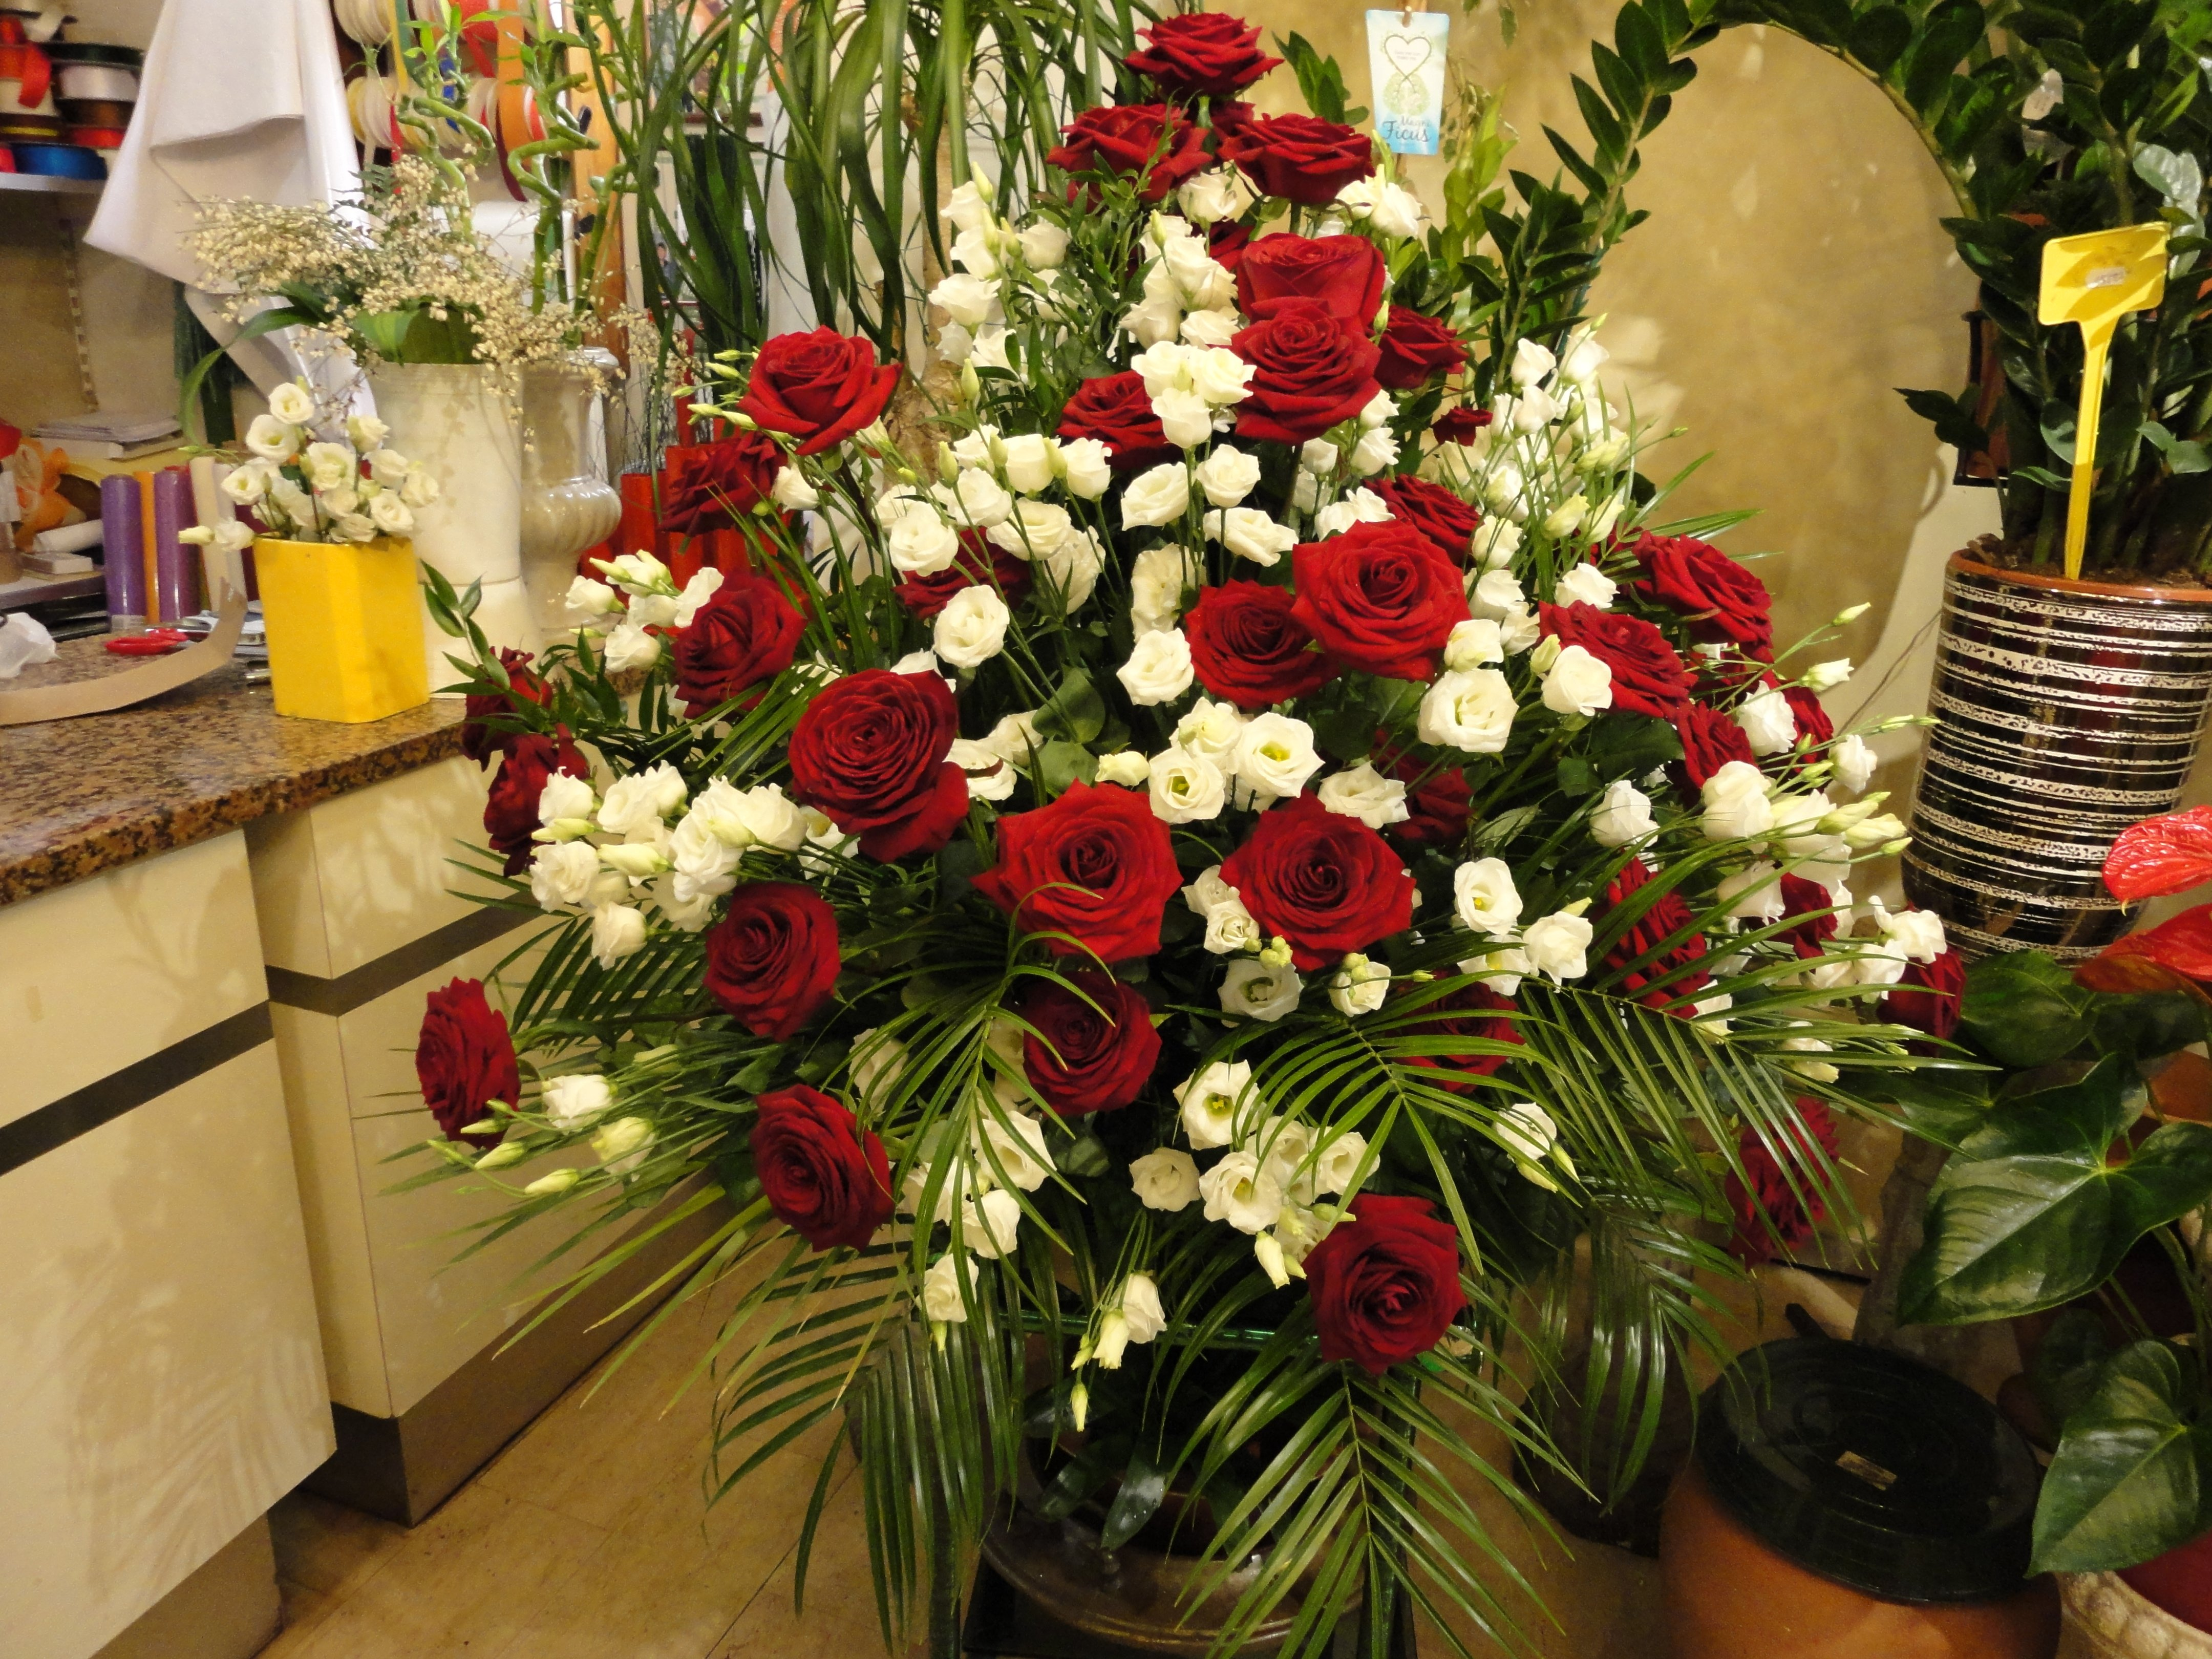 rose bianche e rosse